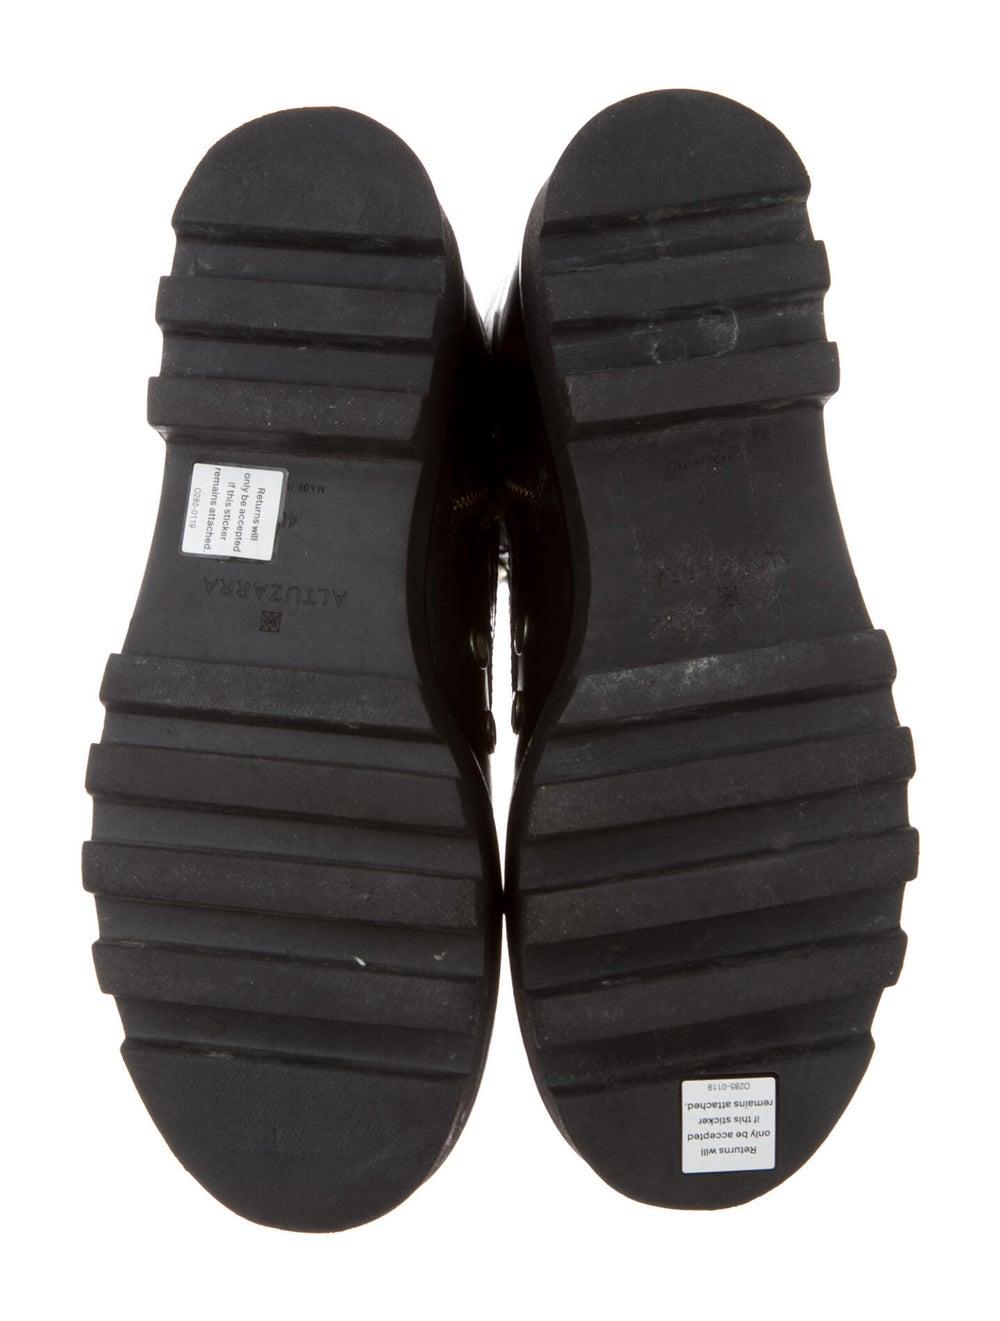 Altuzarra Leather Combat Boots Black - image 5